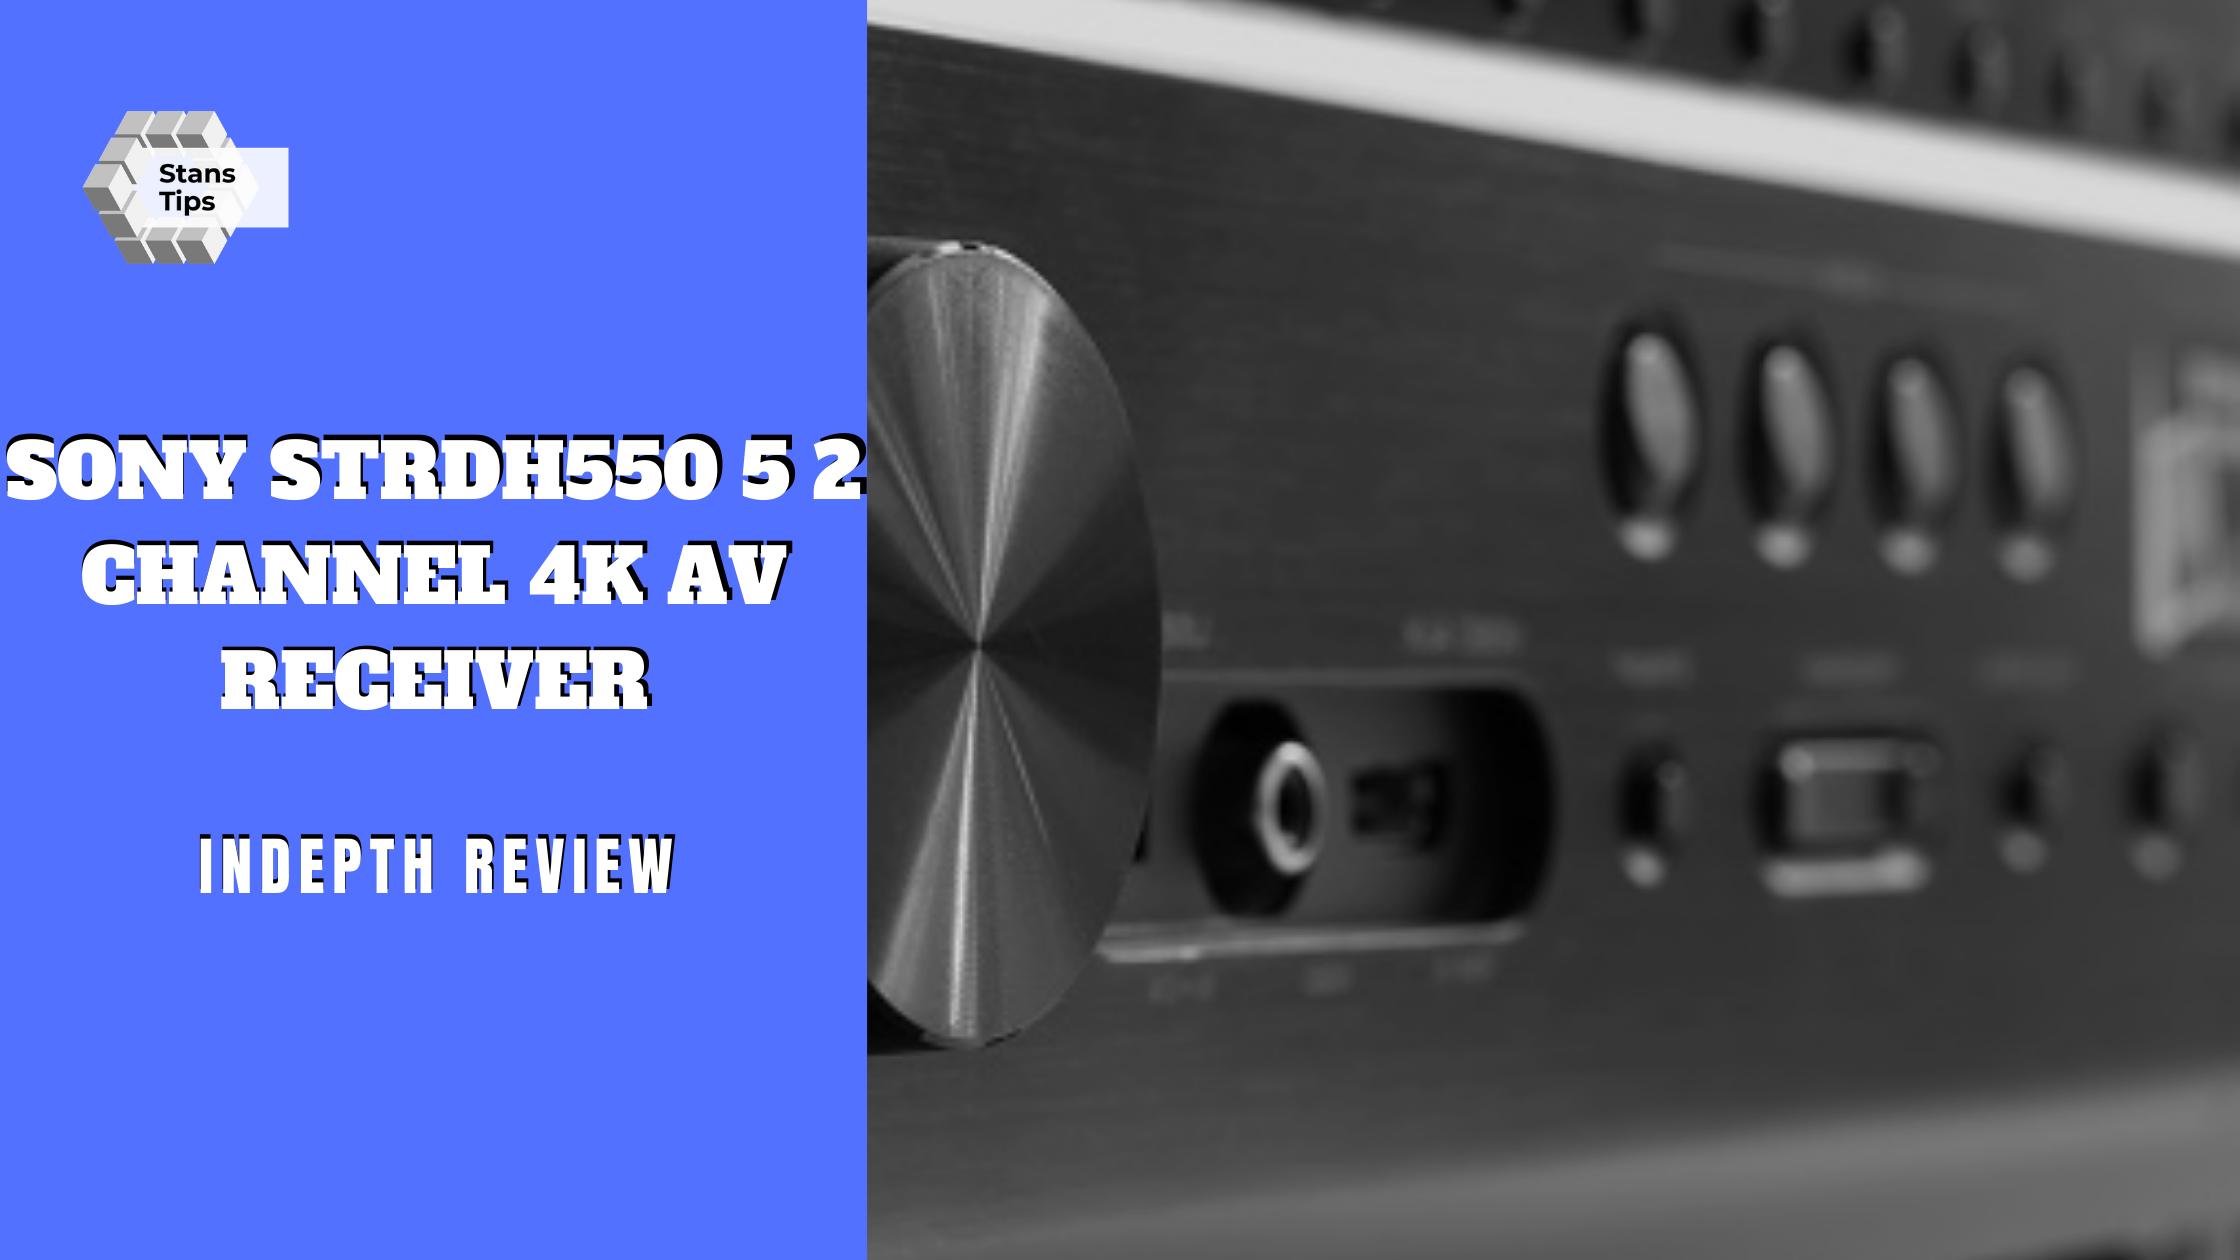 sony strdh550 5 2 channel 4k av receiver review